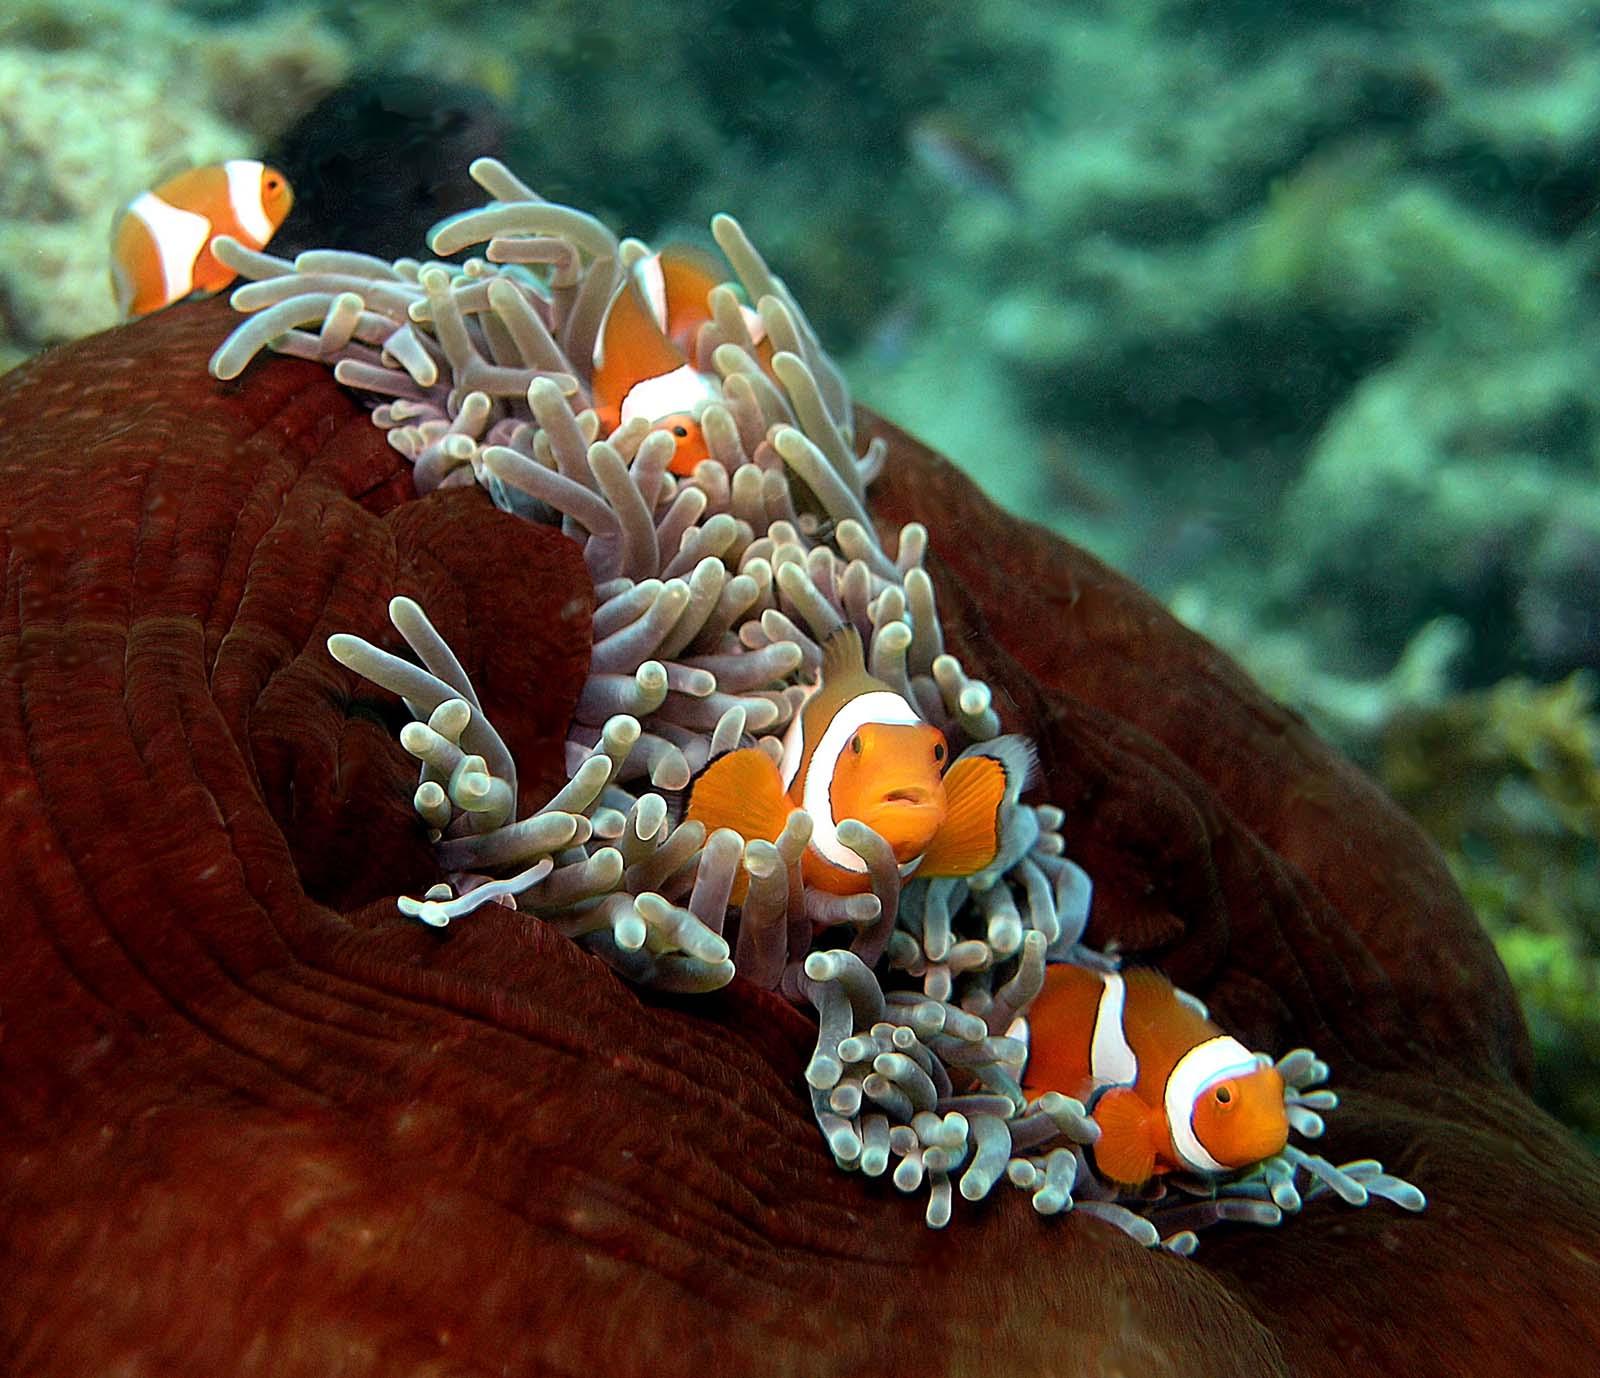 Ocellaris clownfish anemone - photo#22